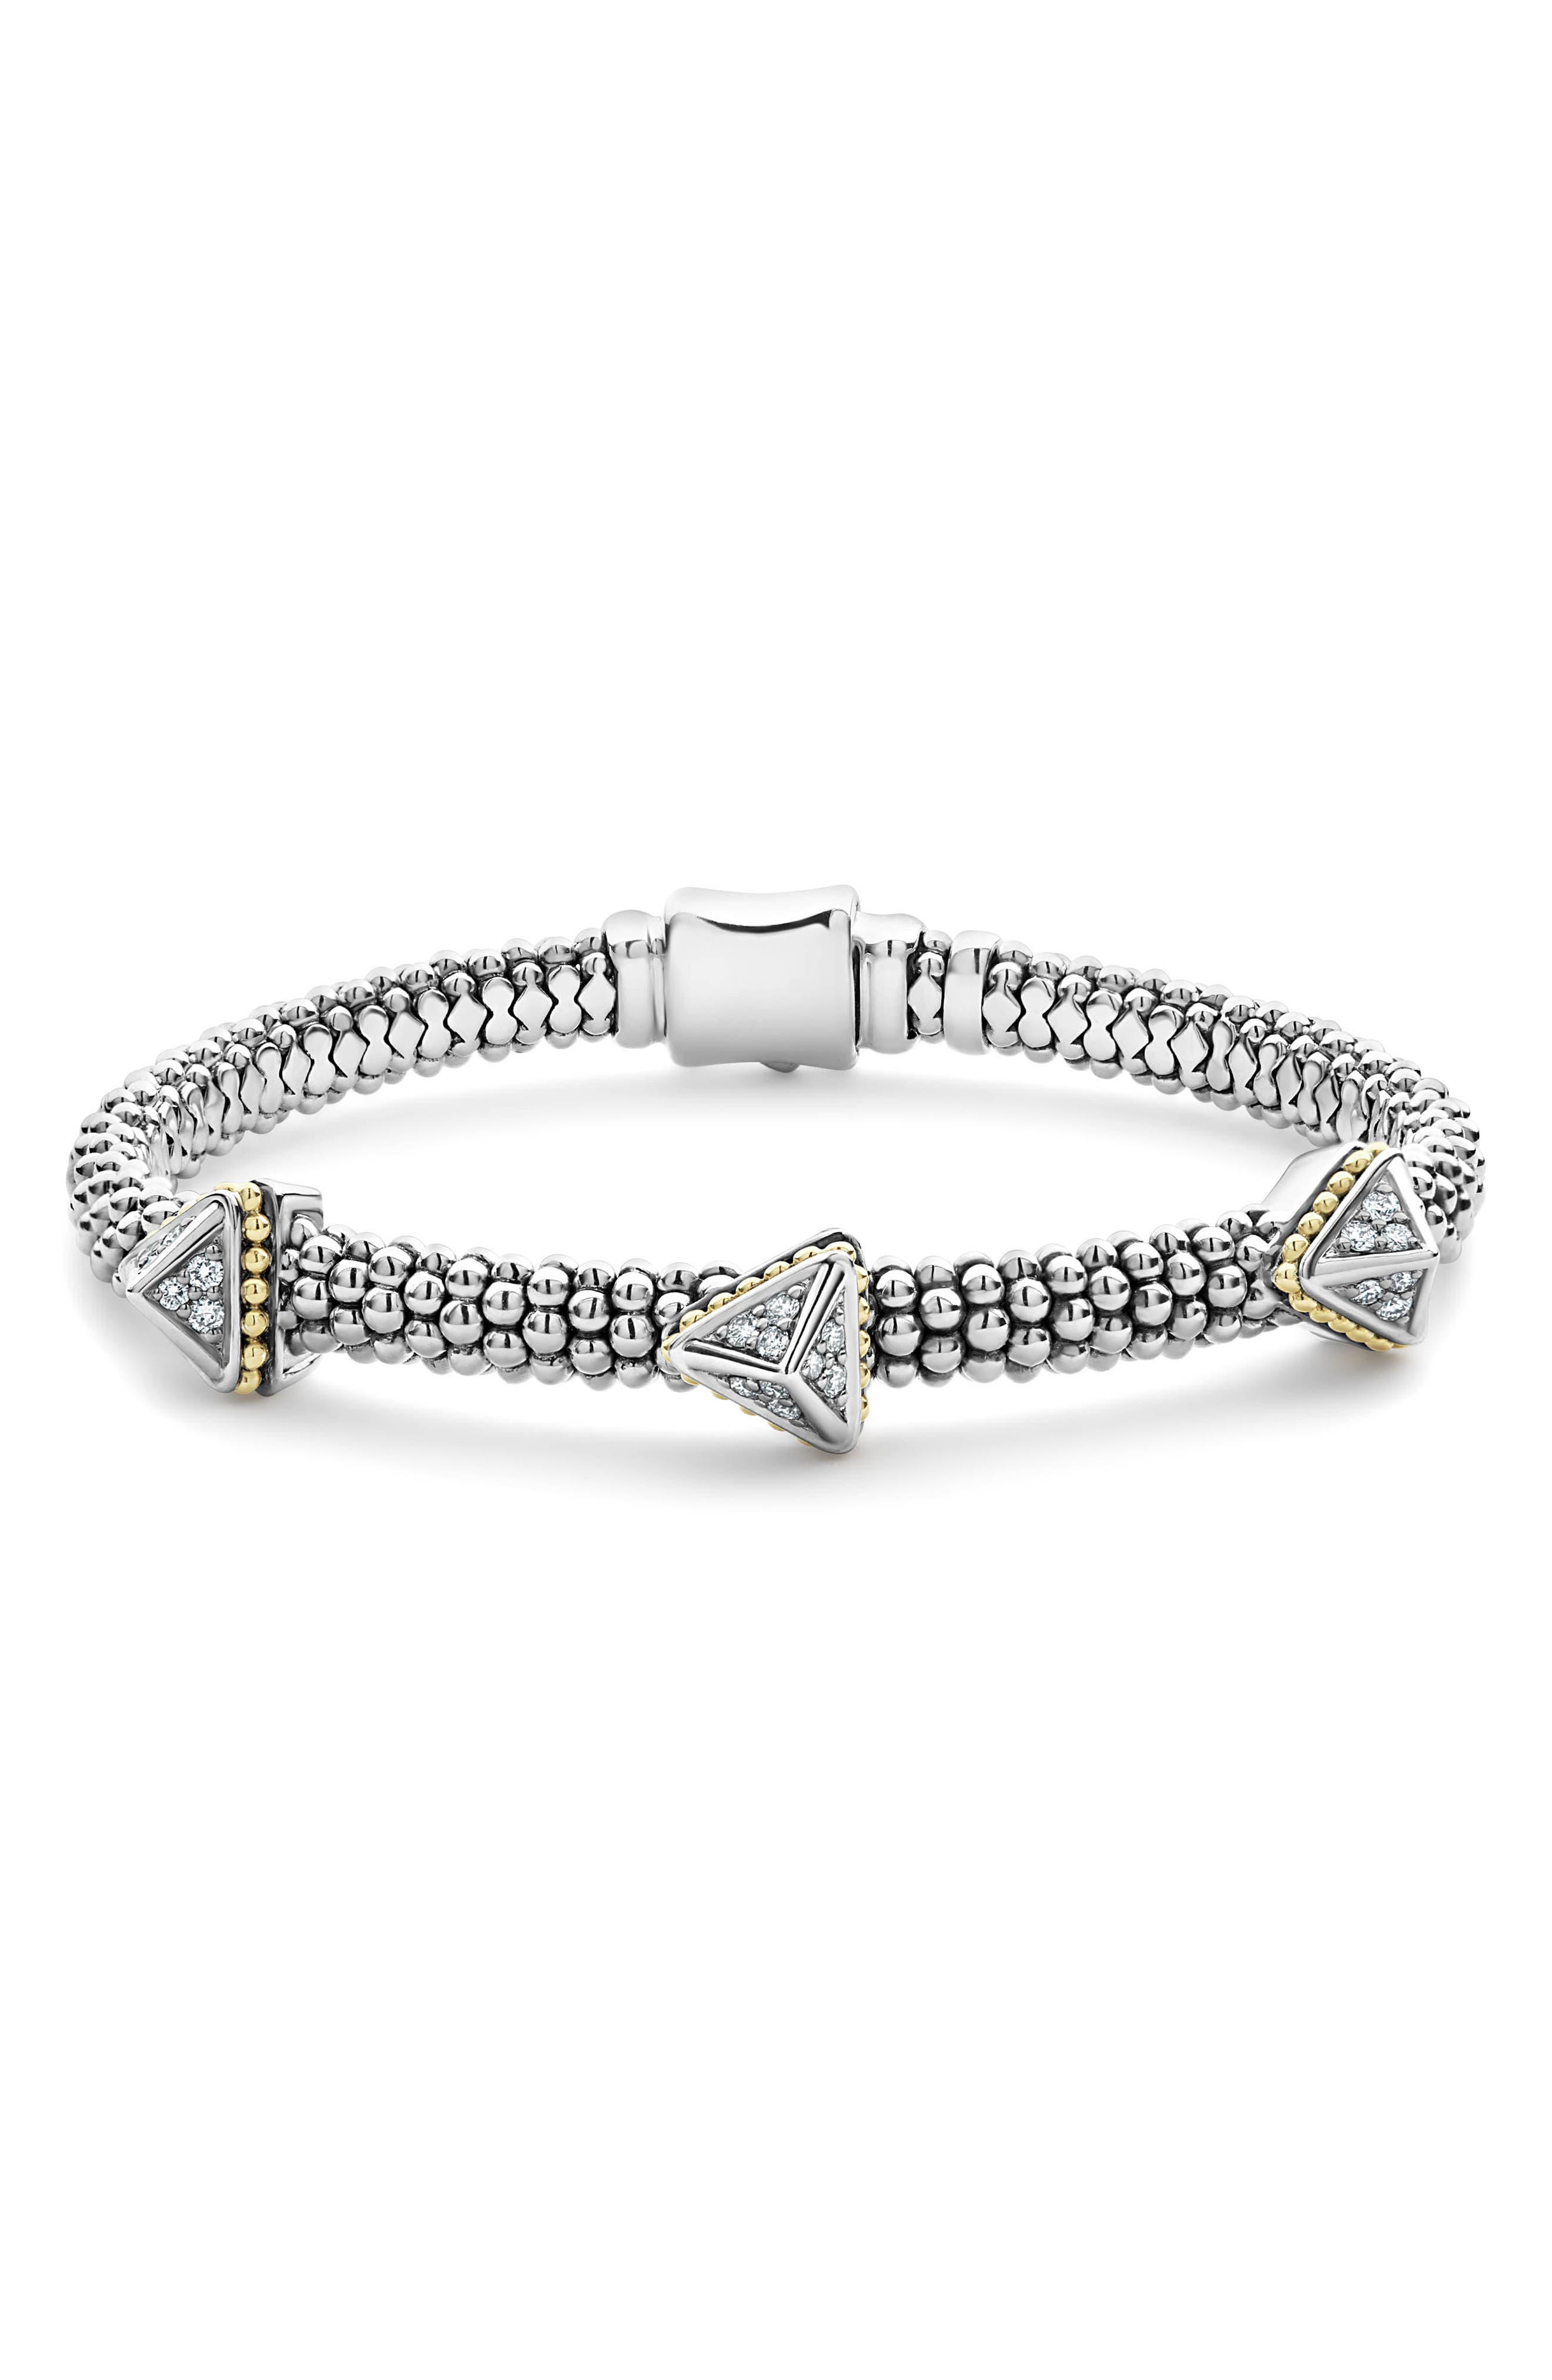 KSL Lux Diamond Pyramid Bracelet,                         Main,                         color, SILVER/ DIAMOND